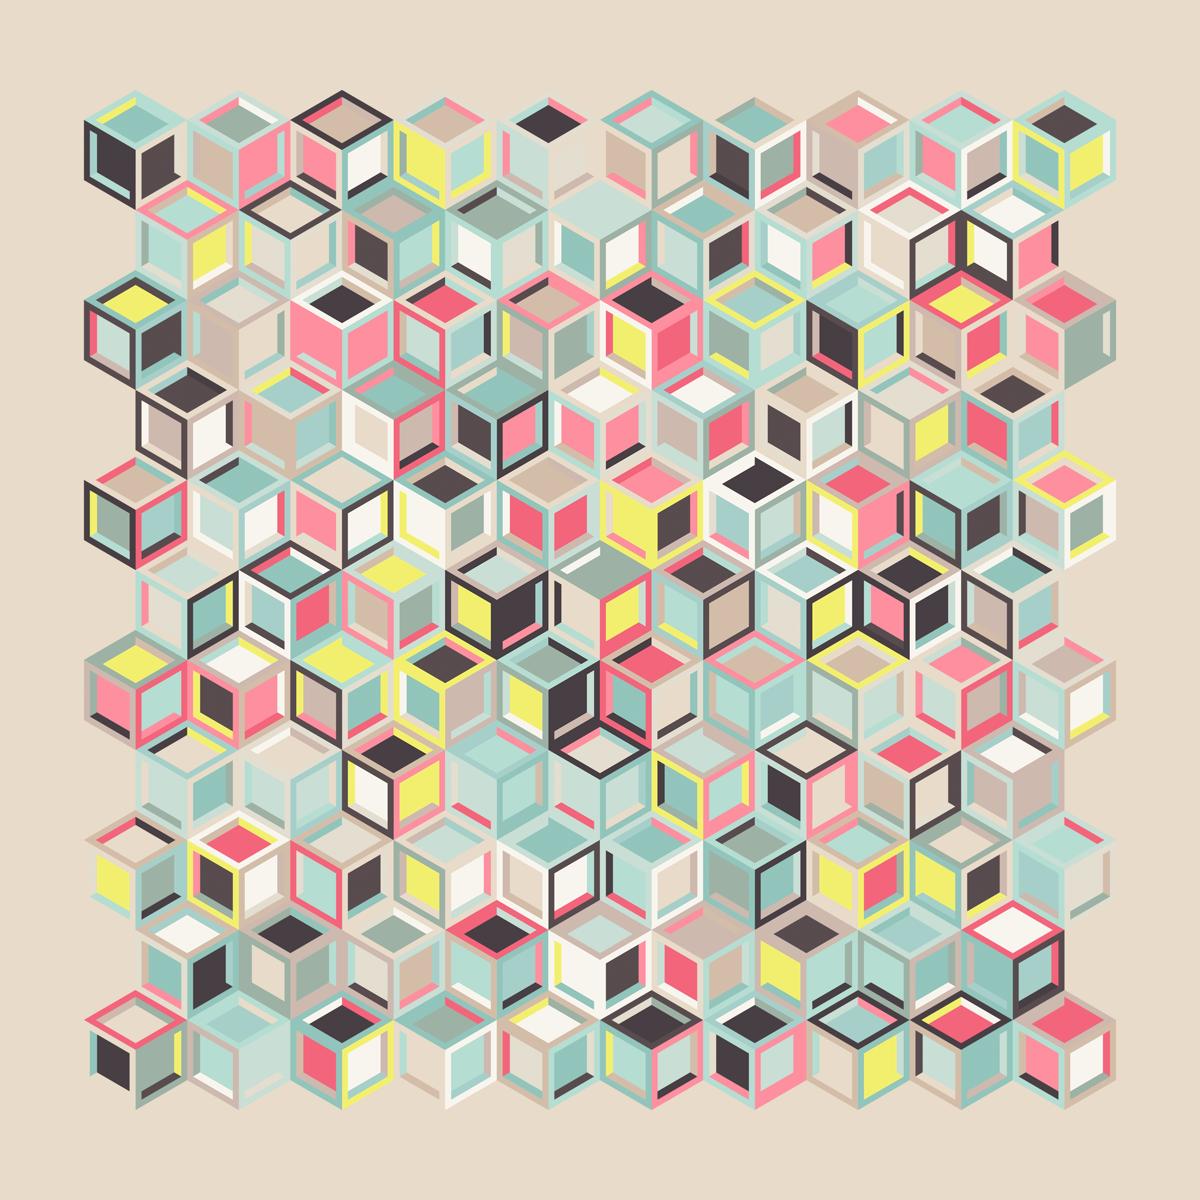 Talkin' 'Bout My Generating by Daniel Stewart - Skillshare